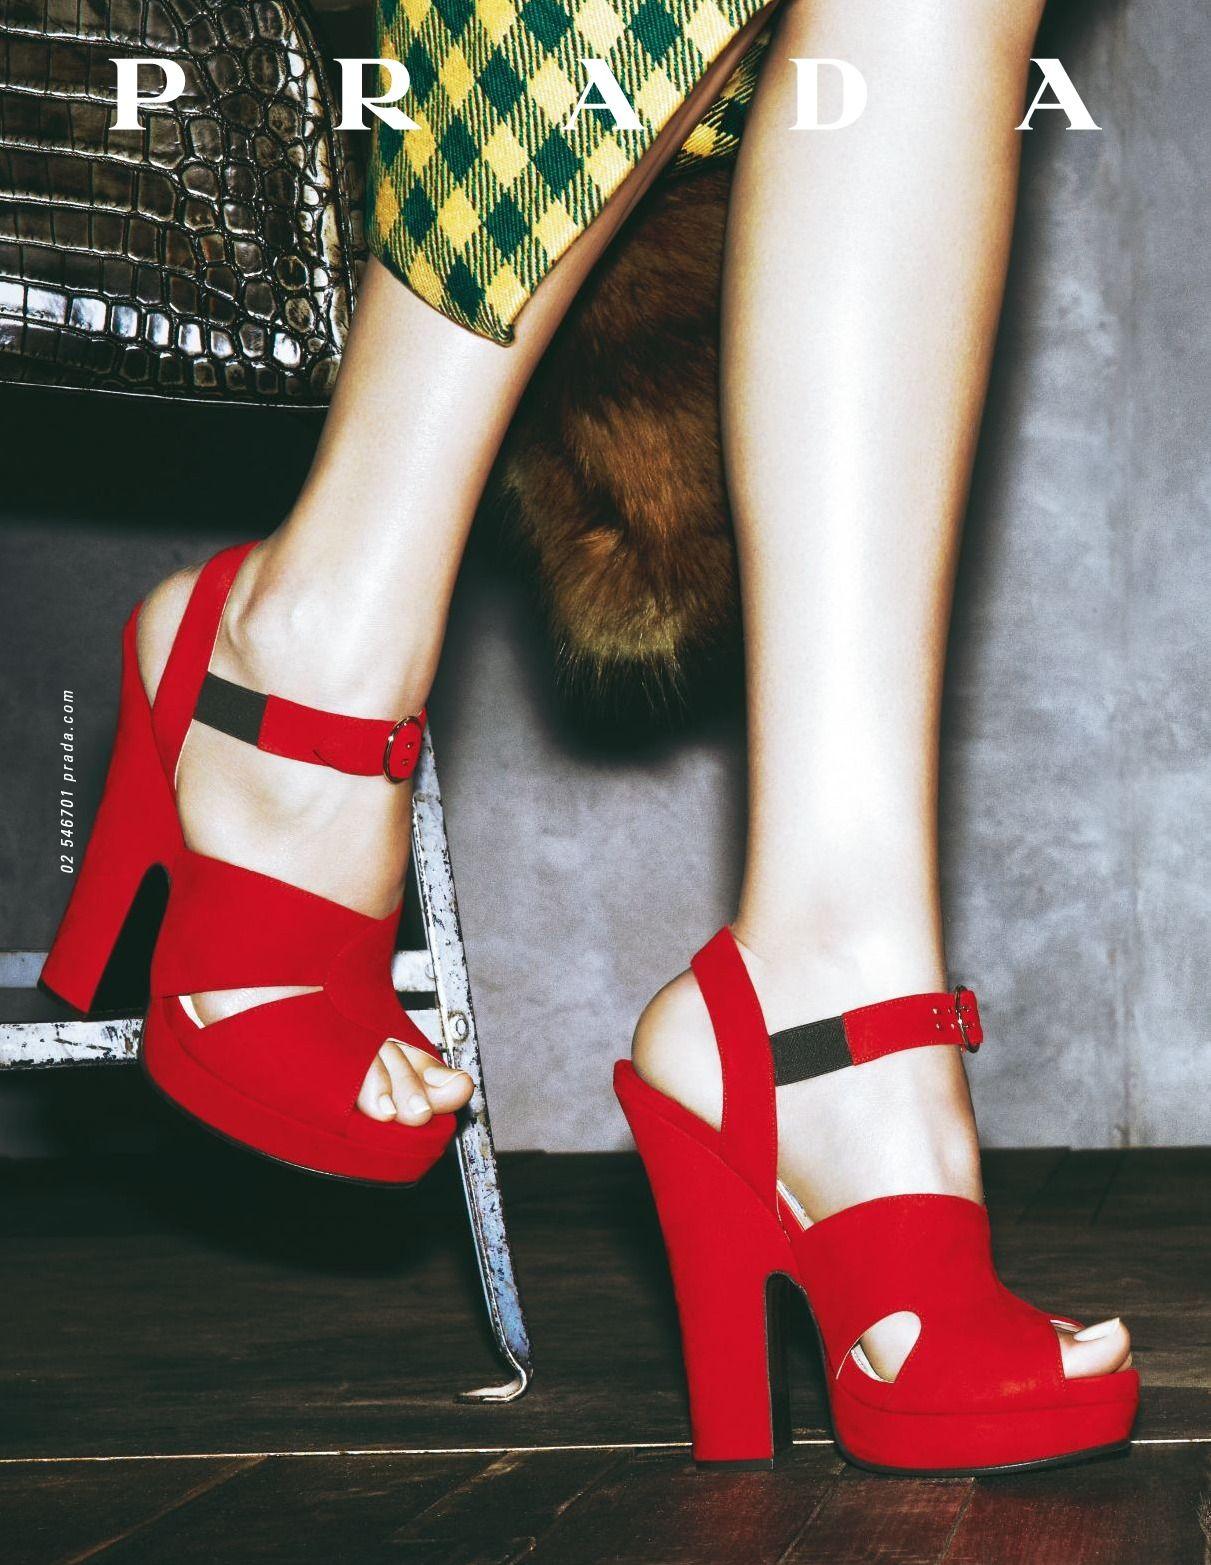 Weekender Bag by Prada | Bags, Fashion bags, Purses, bags